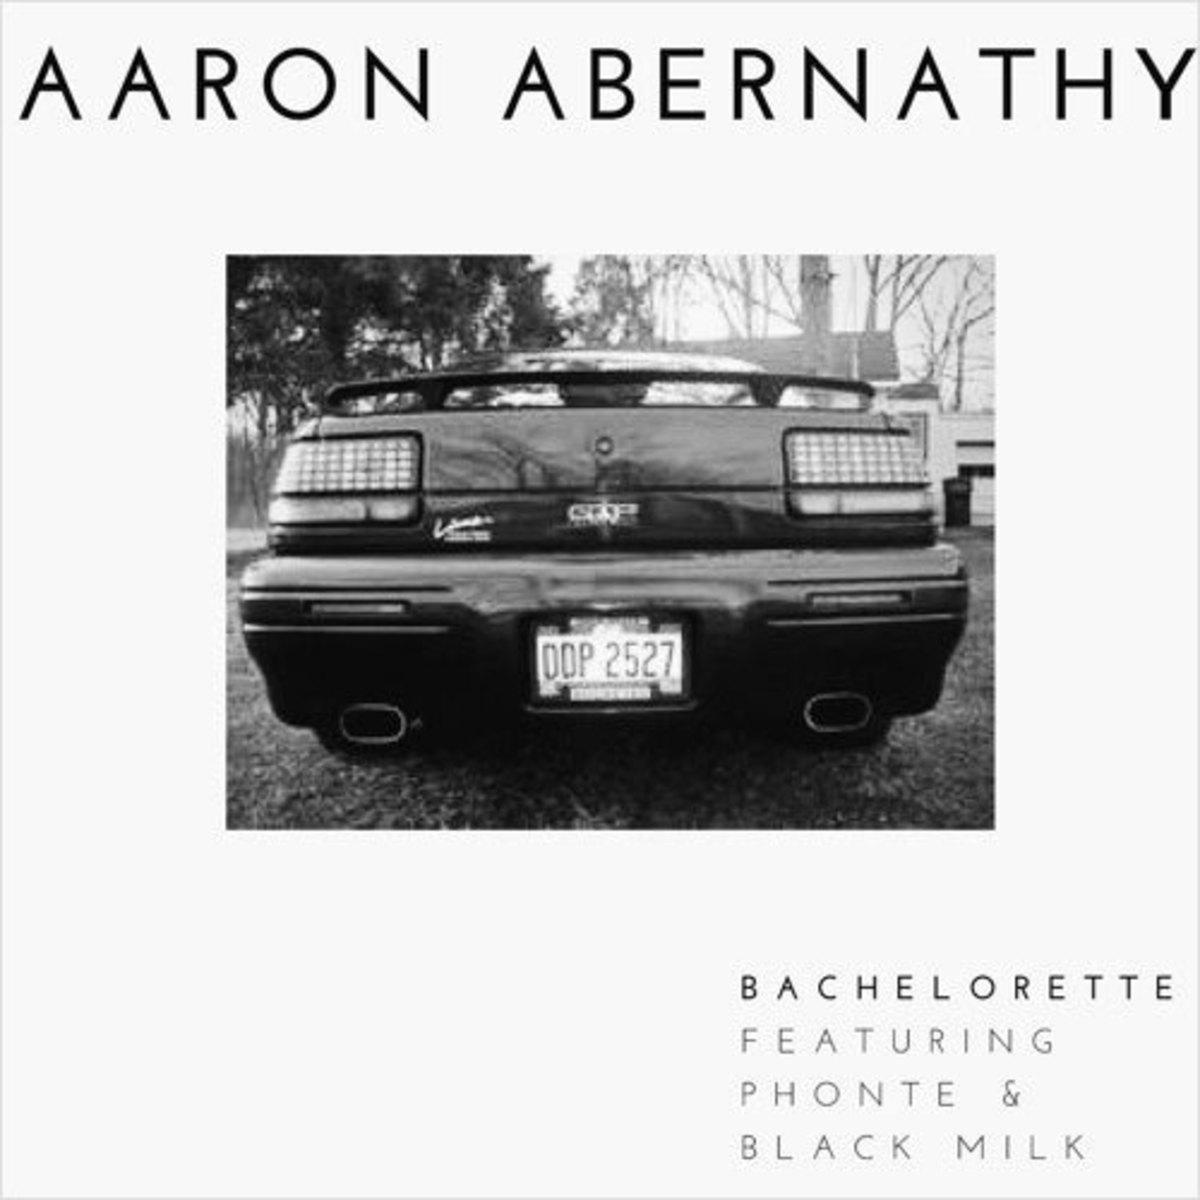 aaron-ab-abernathy-bachelorette.jpg